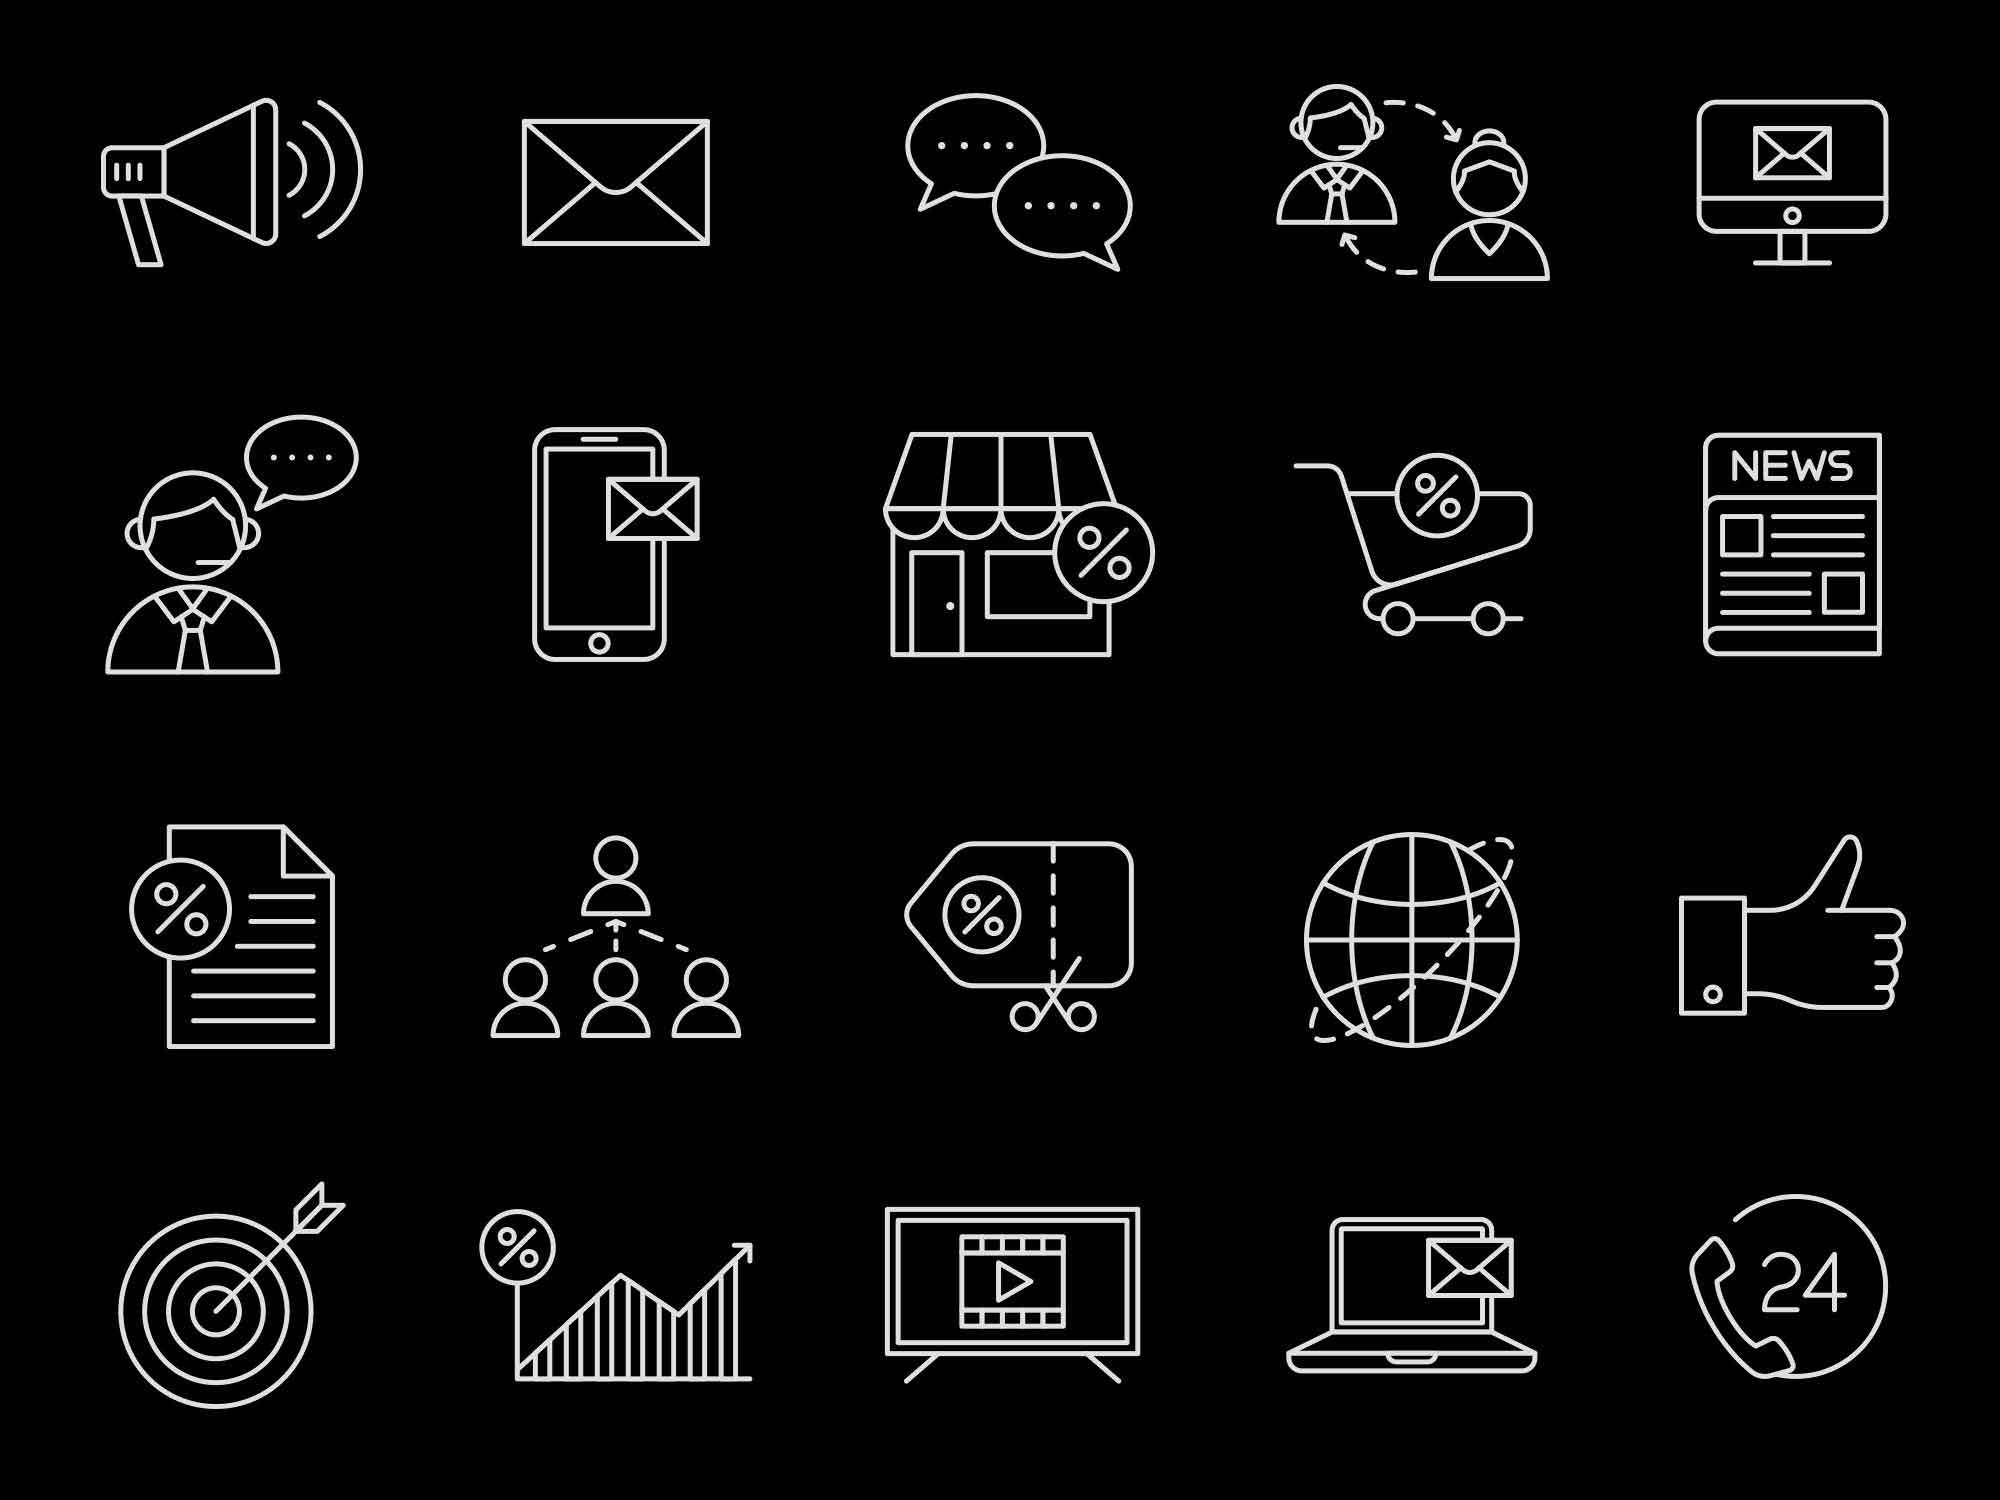 Marketing Vector Icons 2